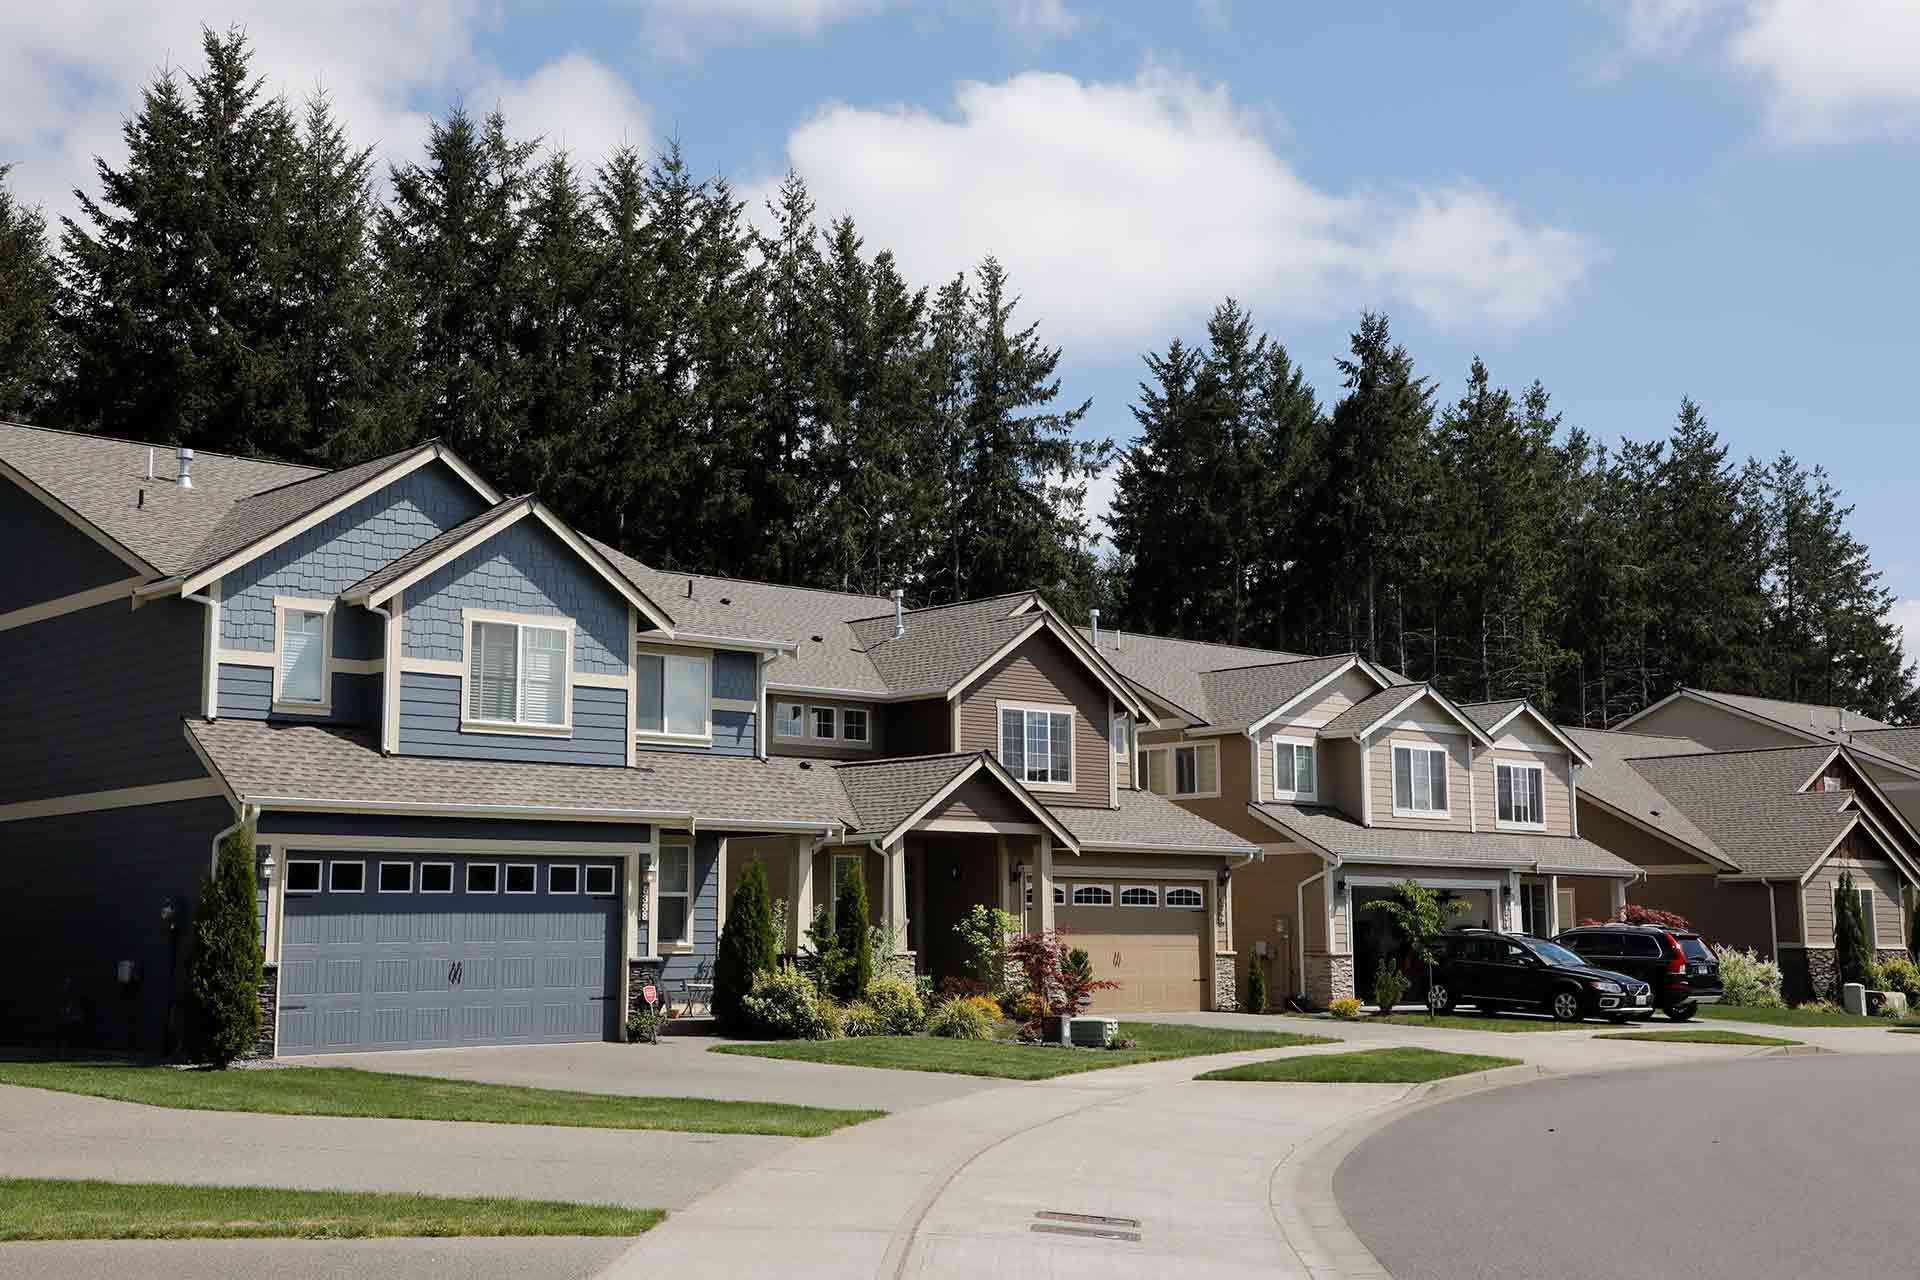 Residential neighborhood, Olympia area, Washington state